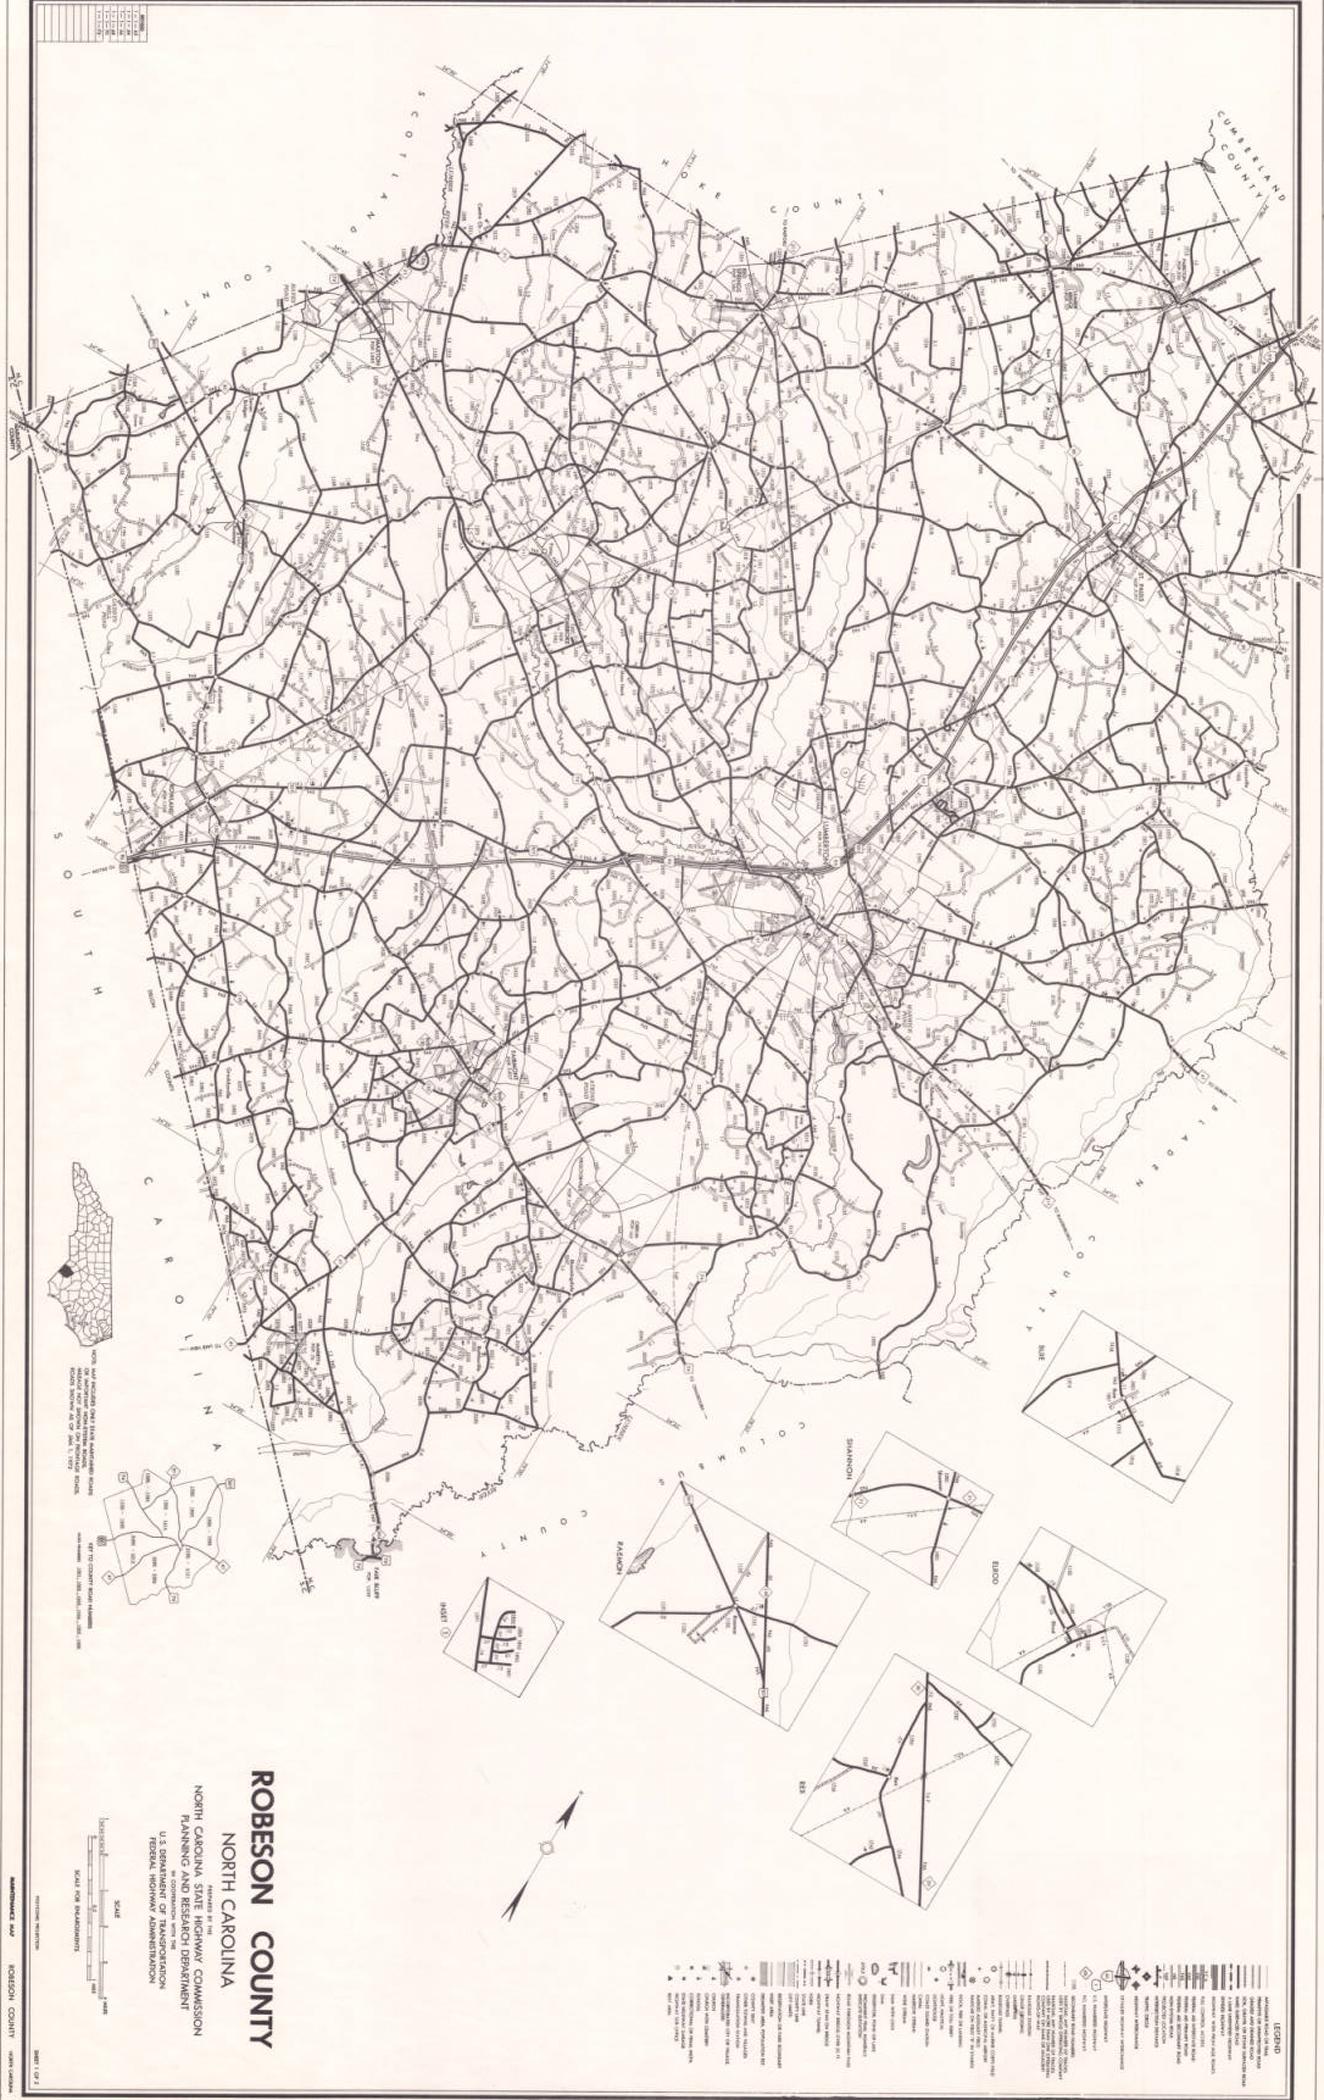 1972 Road Map Of Robeson County North Carolina